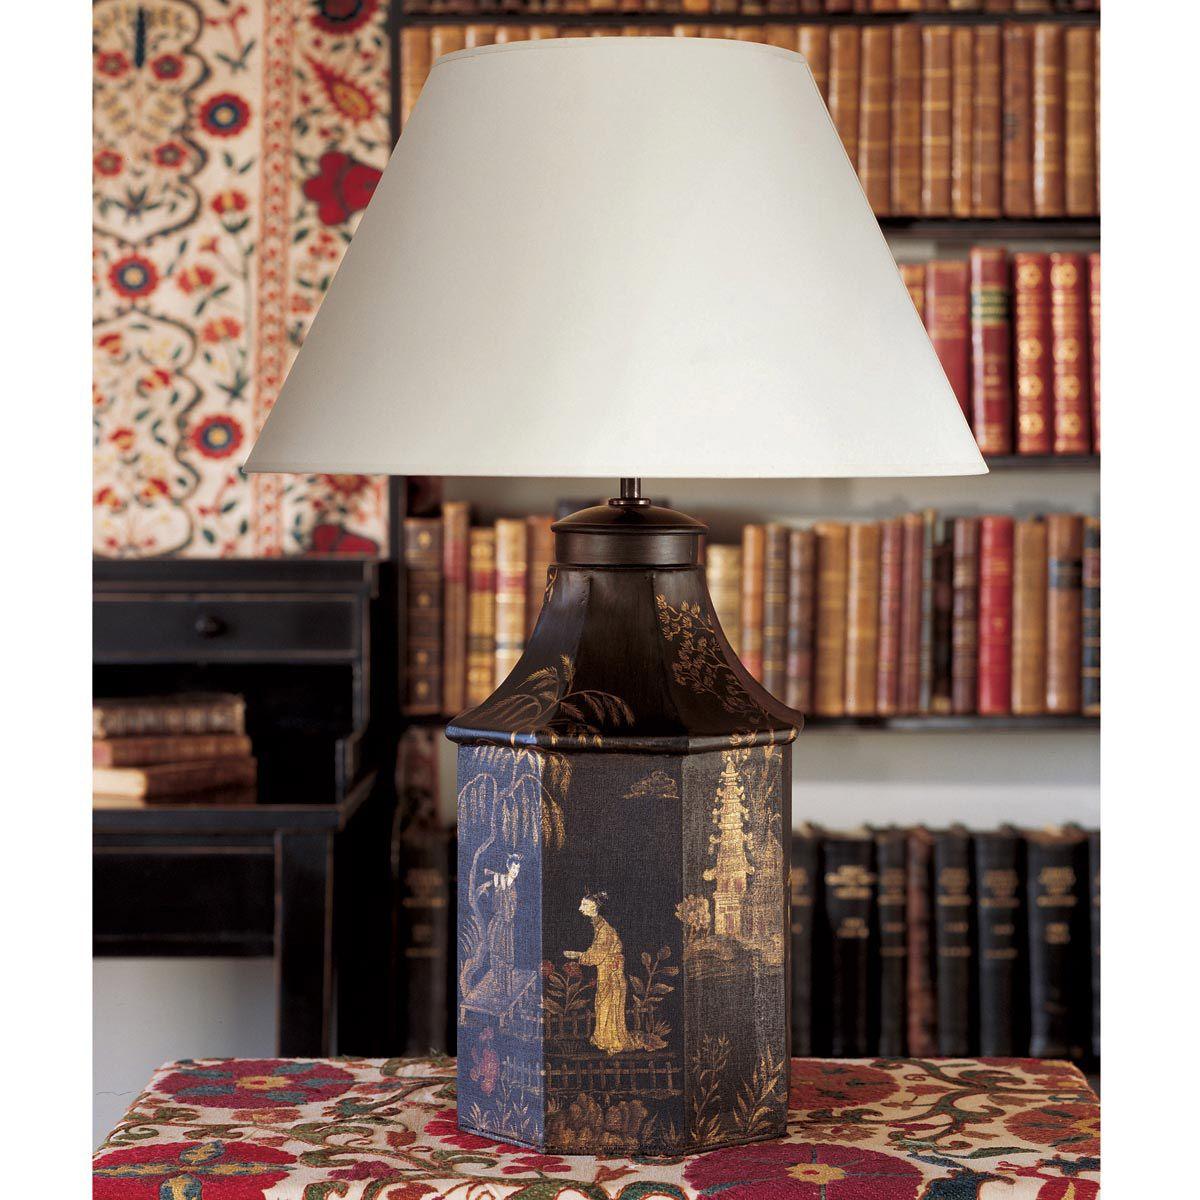 Lipton Table Lamp In 2020 Table Lamp Black Table Lamps Lamp